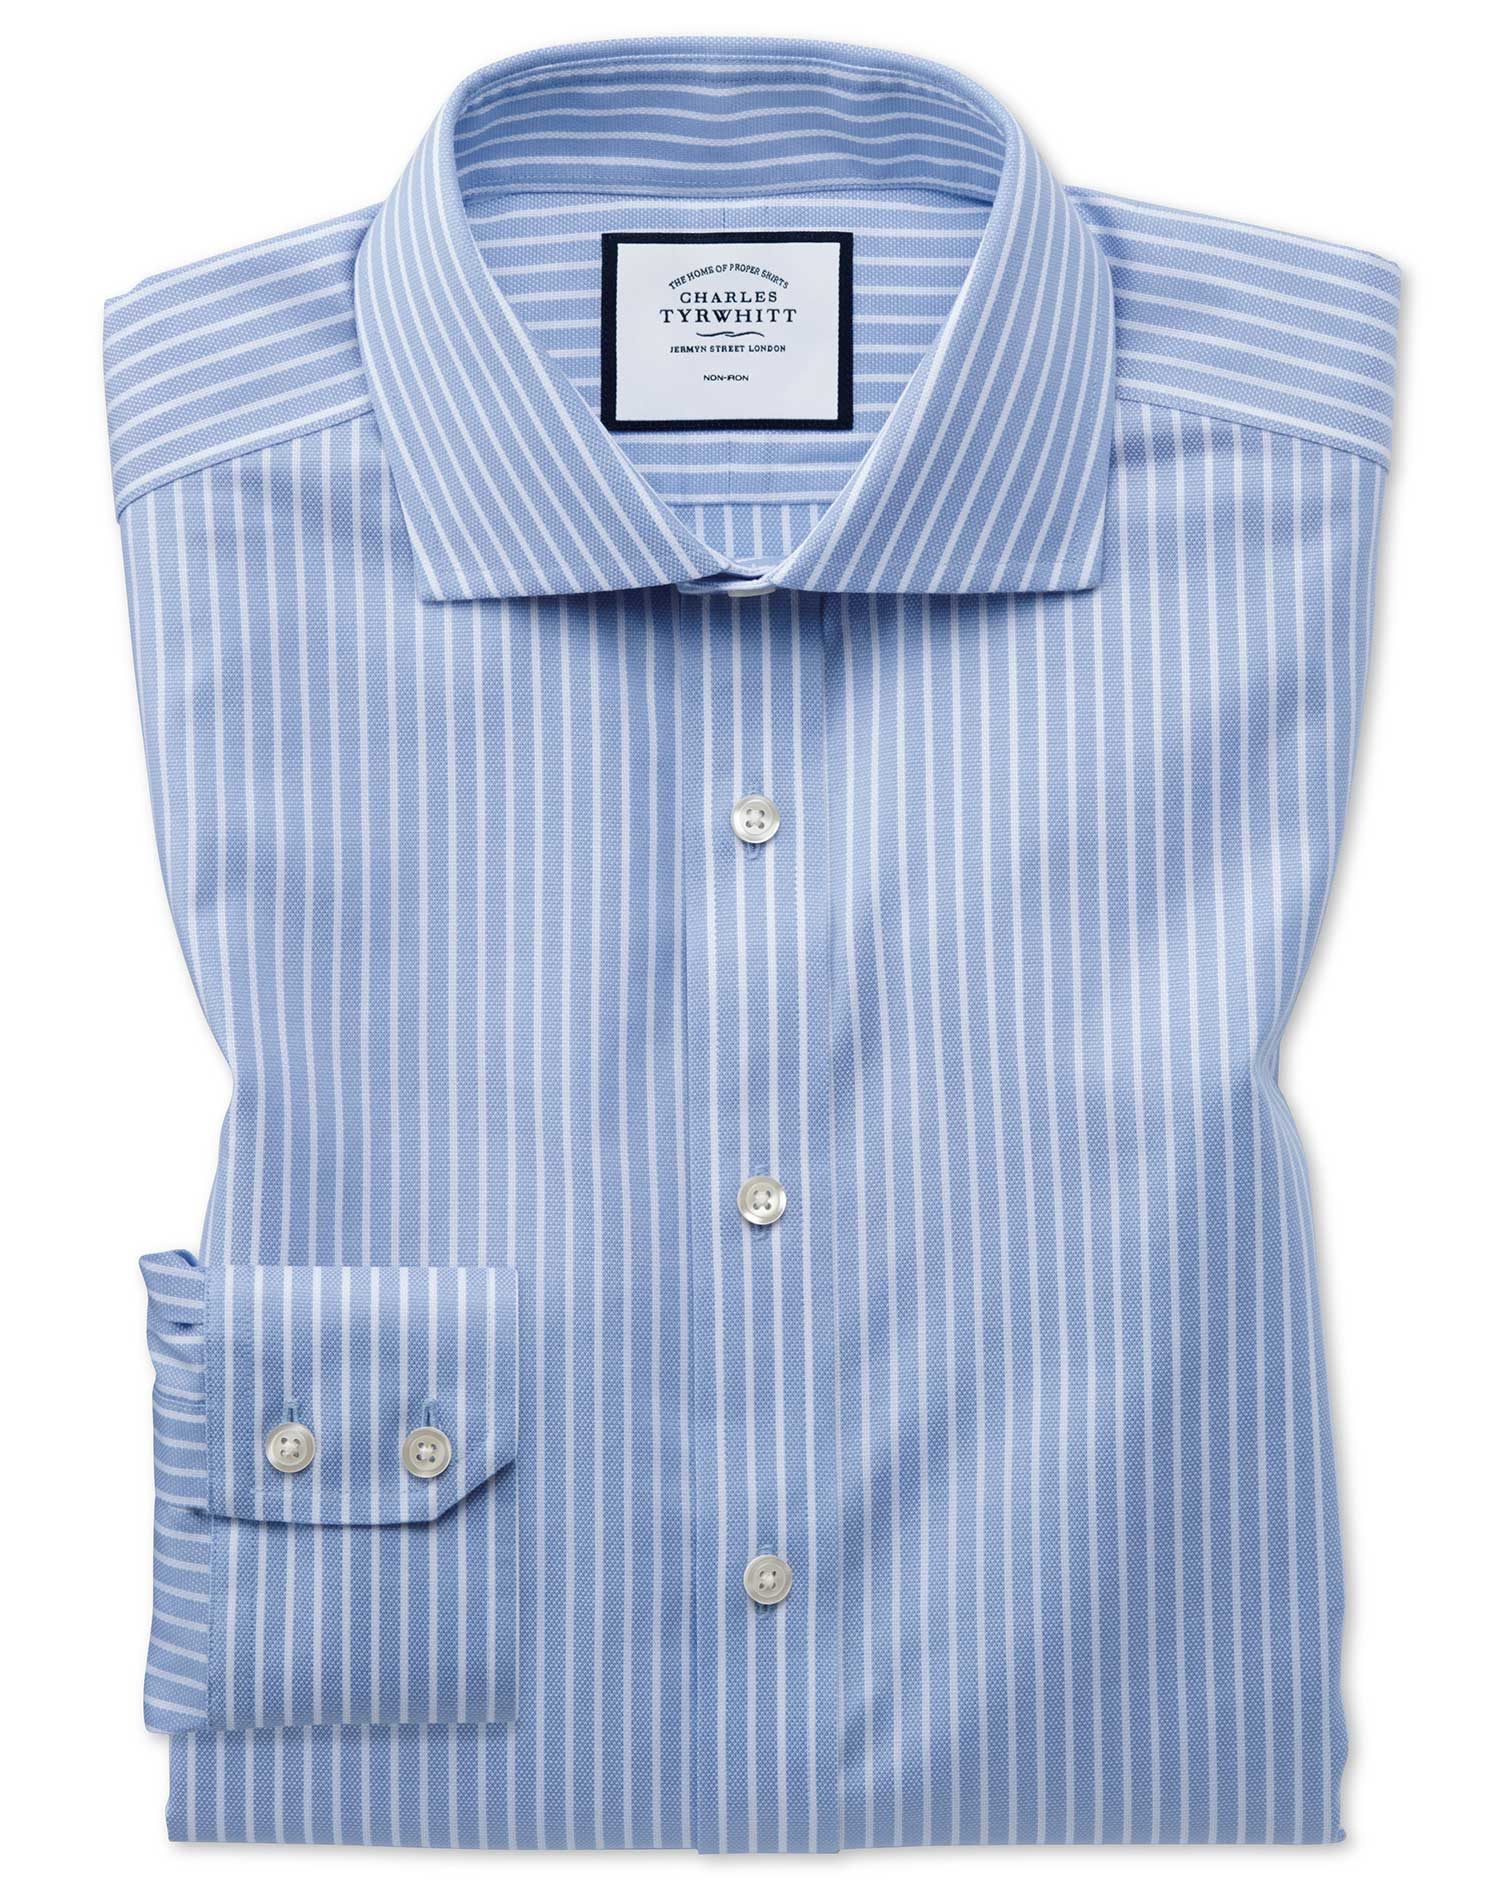 Slim Fit Non-Iron Cotton Stretch Oxford Sky Blue and White Stripe Formal Shirt Single Cuff Size 15.5